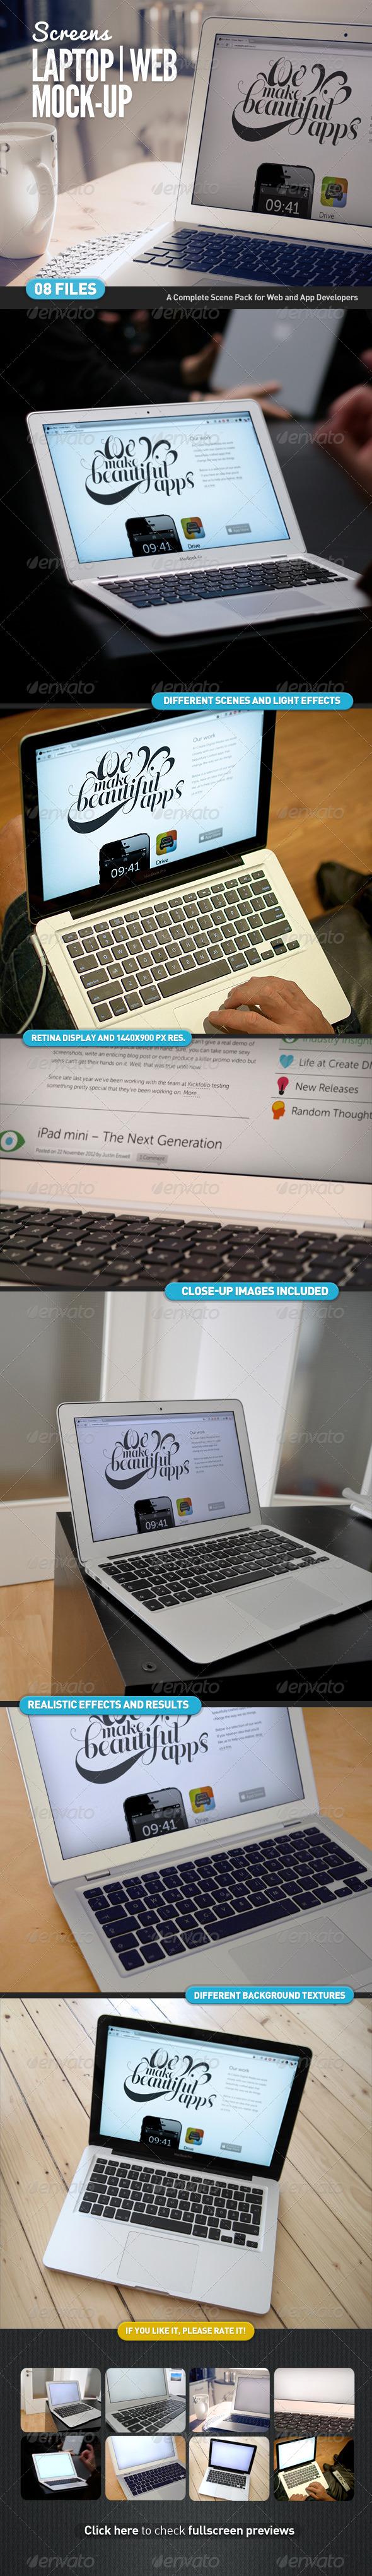 GraphicRiver Laptop Web App Mock-Up 4516321